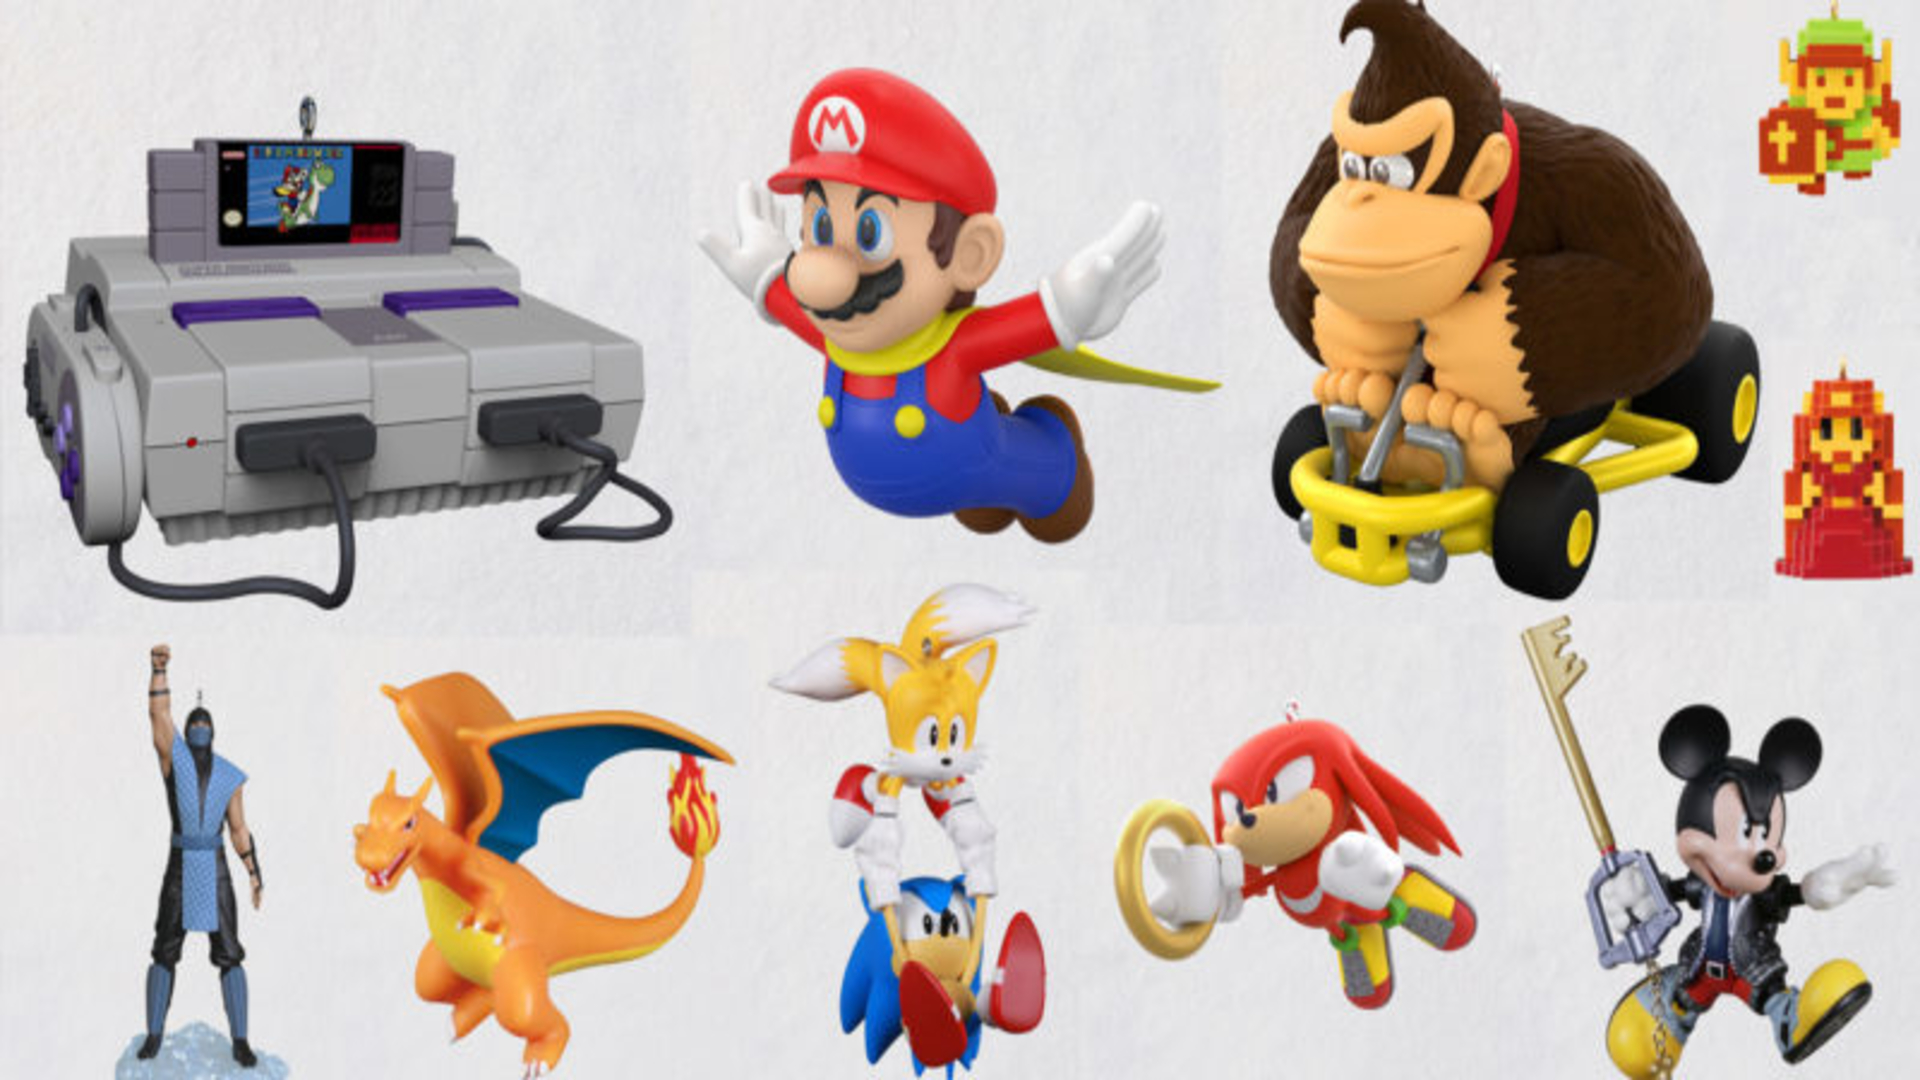 Hallmark Reveals 2021 Nintendo-Inspired Ornament Collection